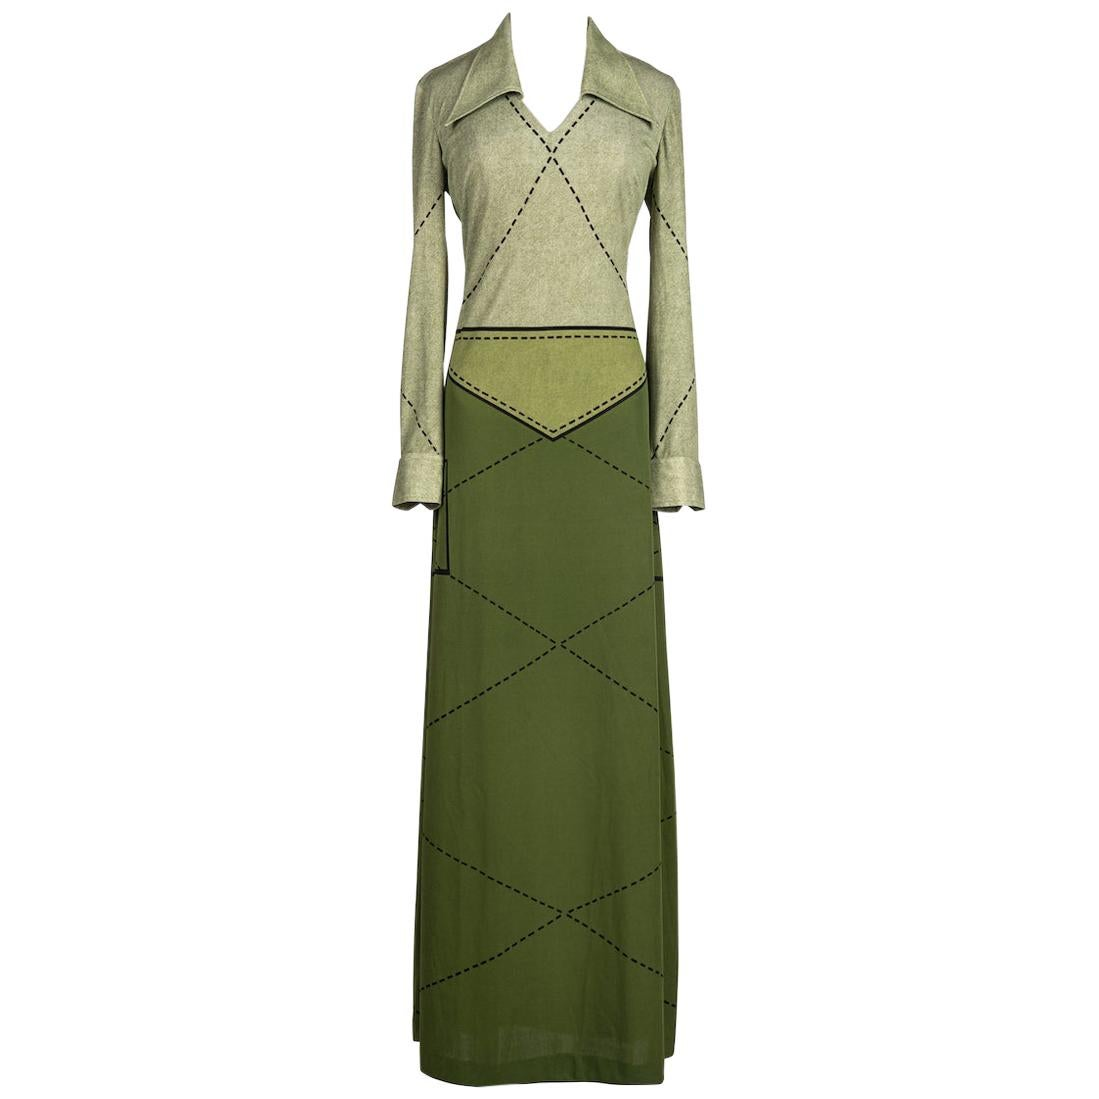 "1976 ROBERTA DI CAMERINO ""Hippie"" Green Jersey Trompe l'Oeil Print Maxi Dress"